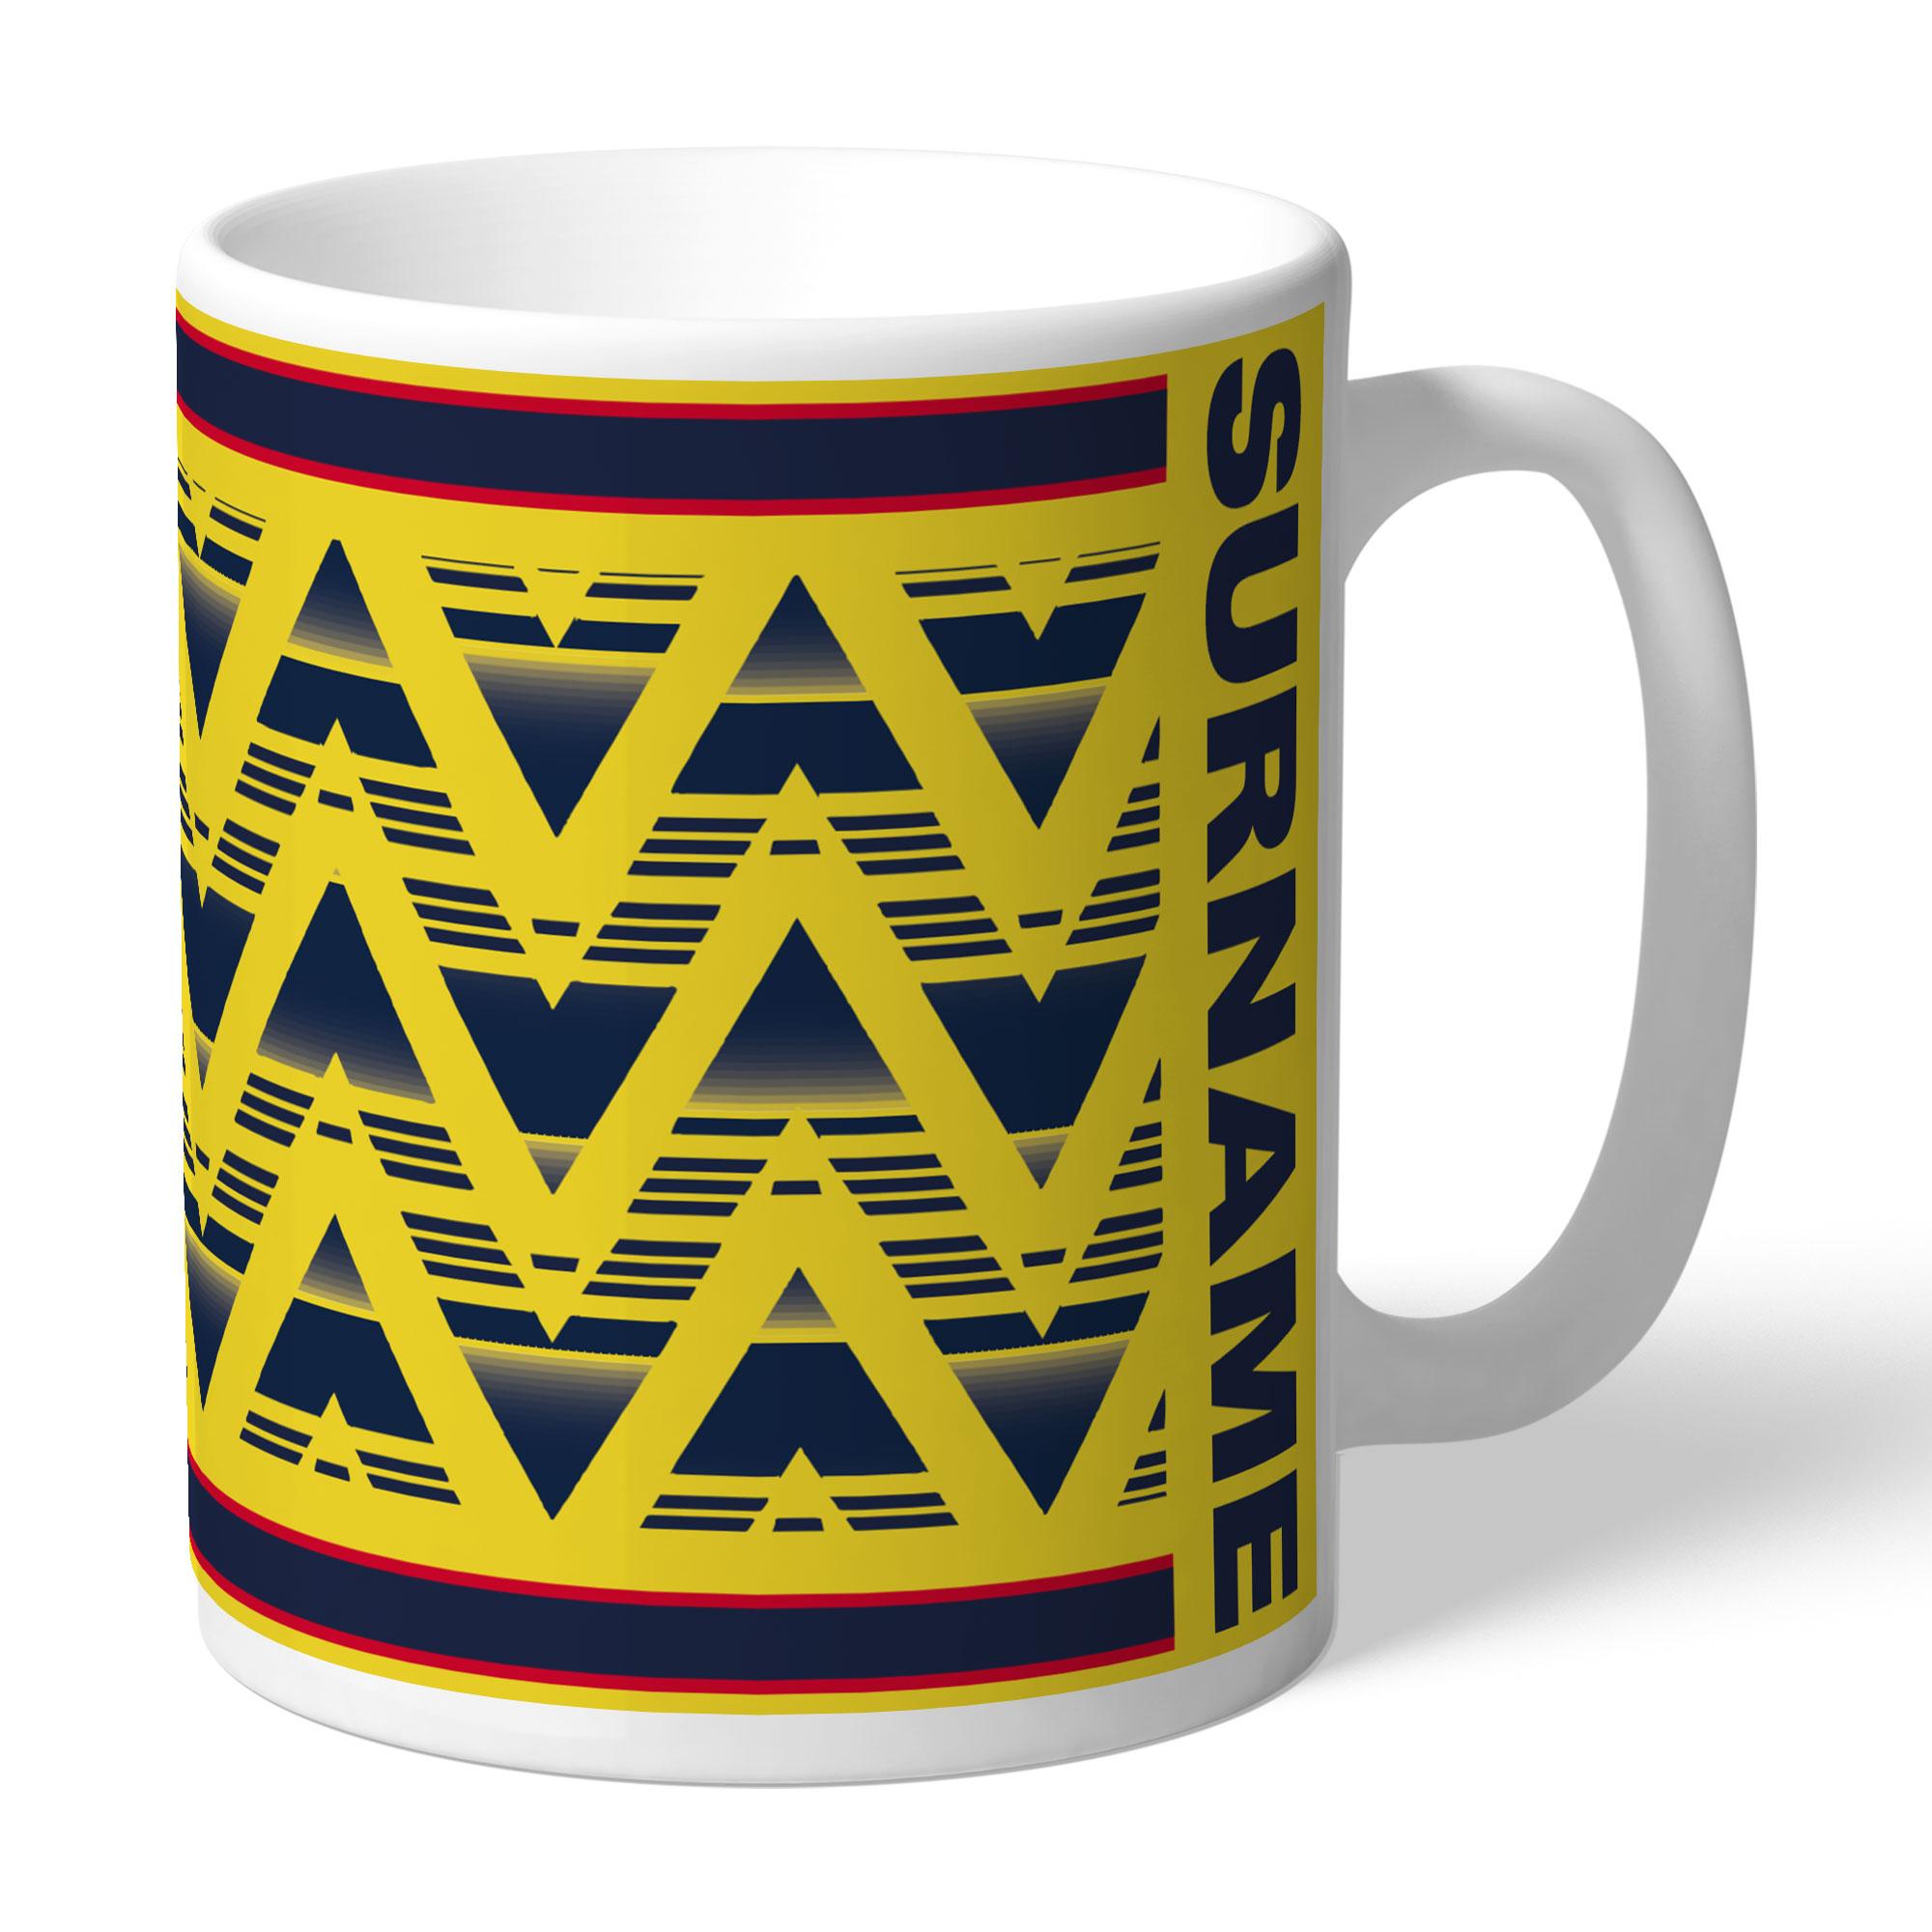 Arsenal FC Bruised Banana Mug